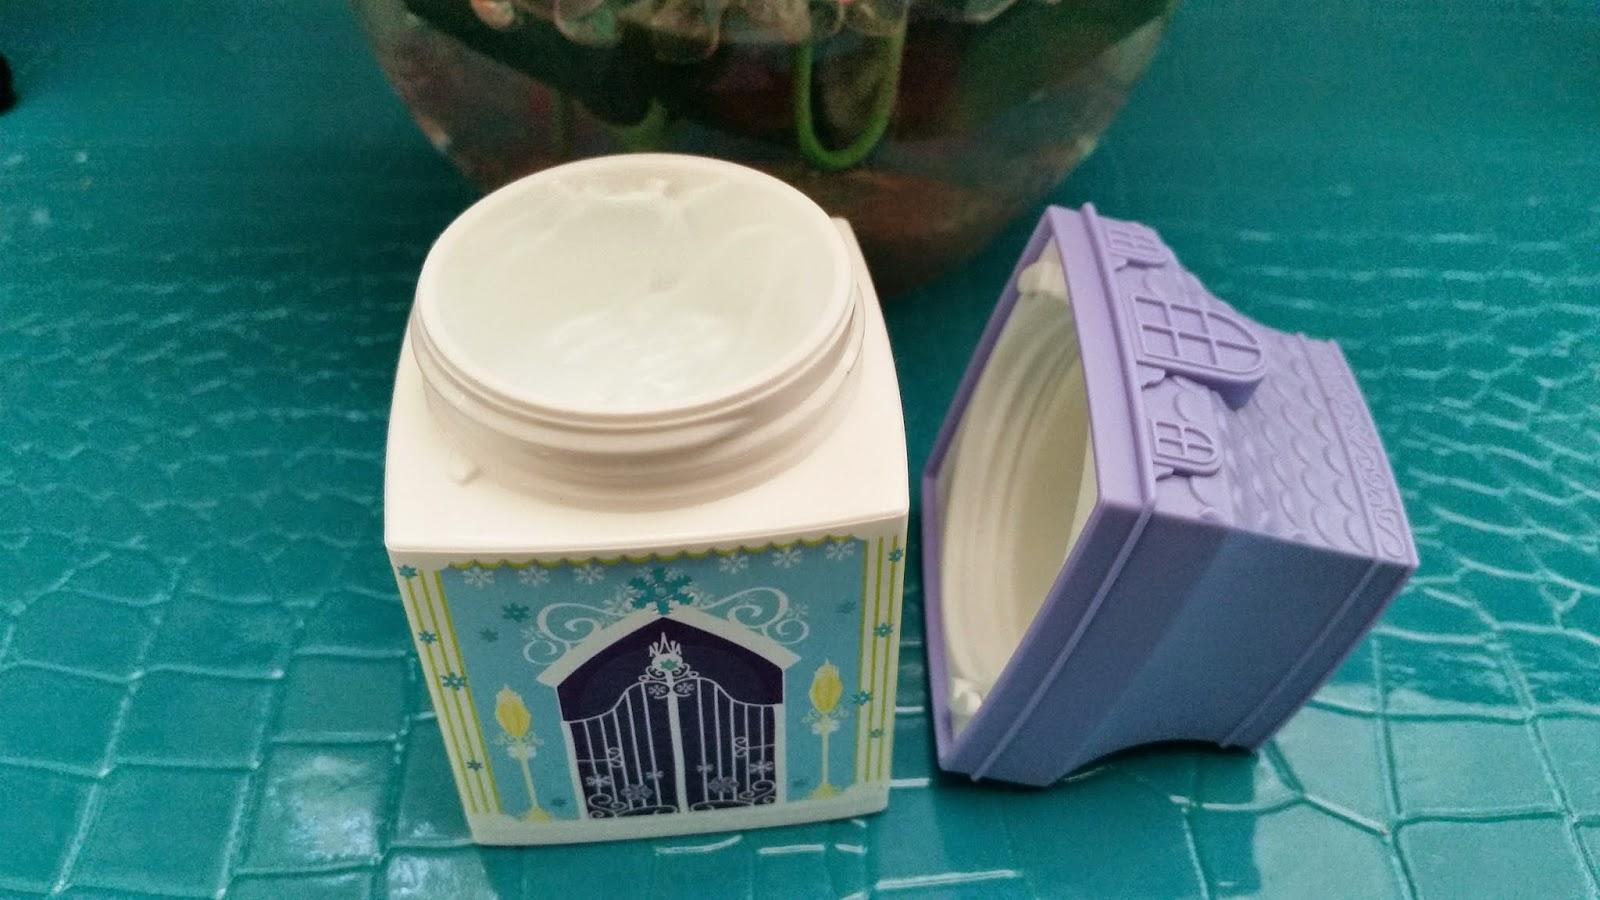 Etude House Castle Hand Cream Ice Frozen